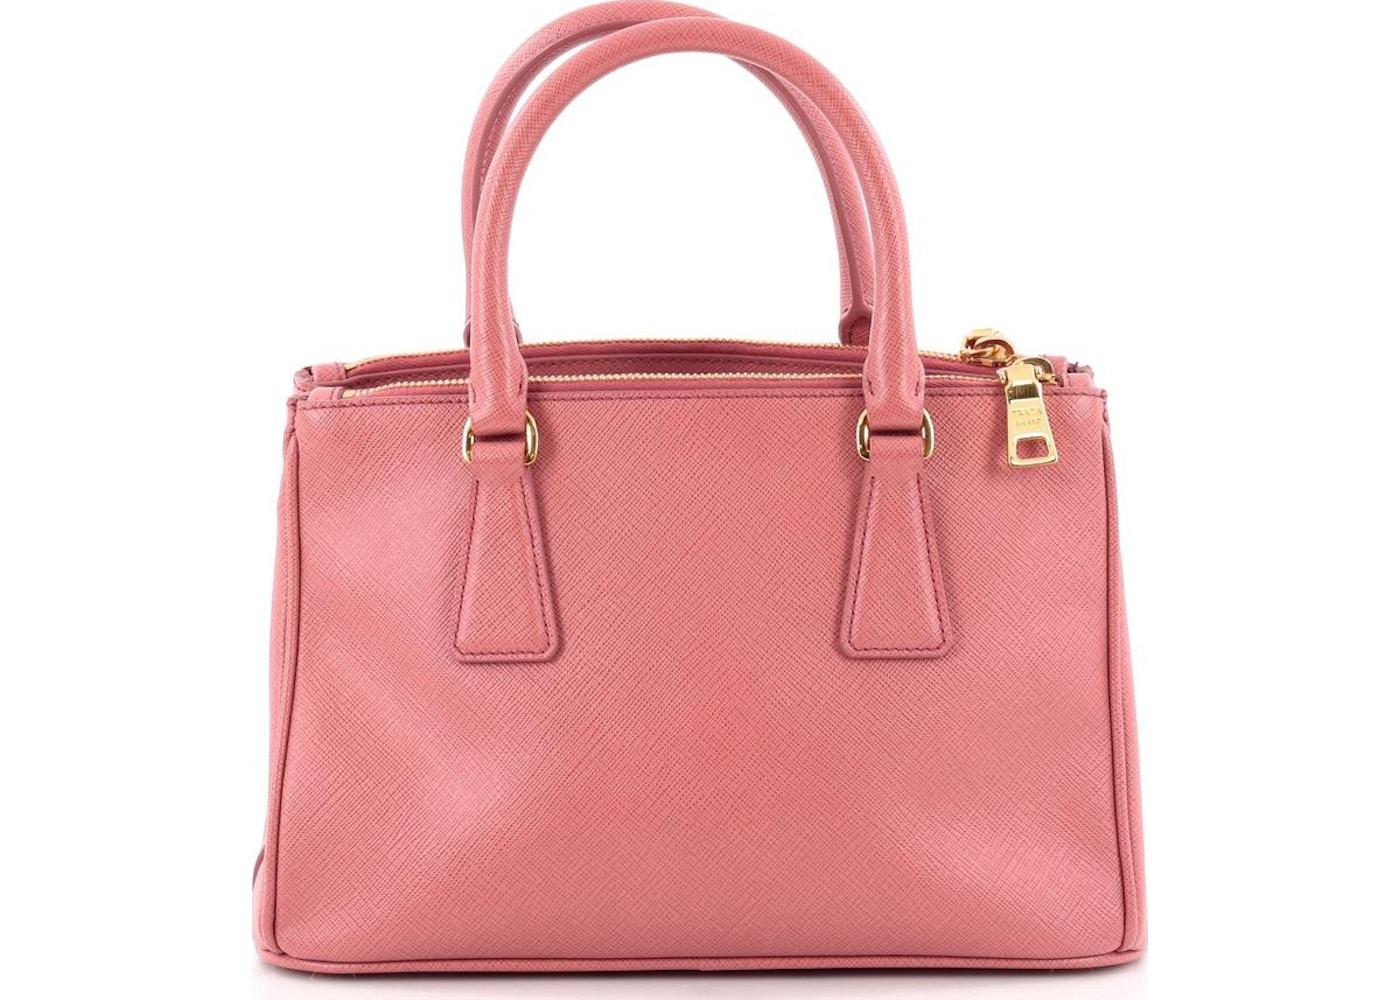 c4e478ce2c1c2 Prada Double Zip Lux Tote Saffiano Mini Tamaris Pink